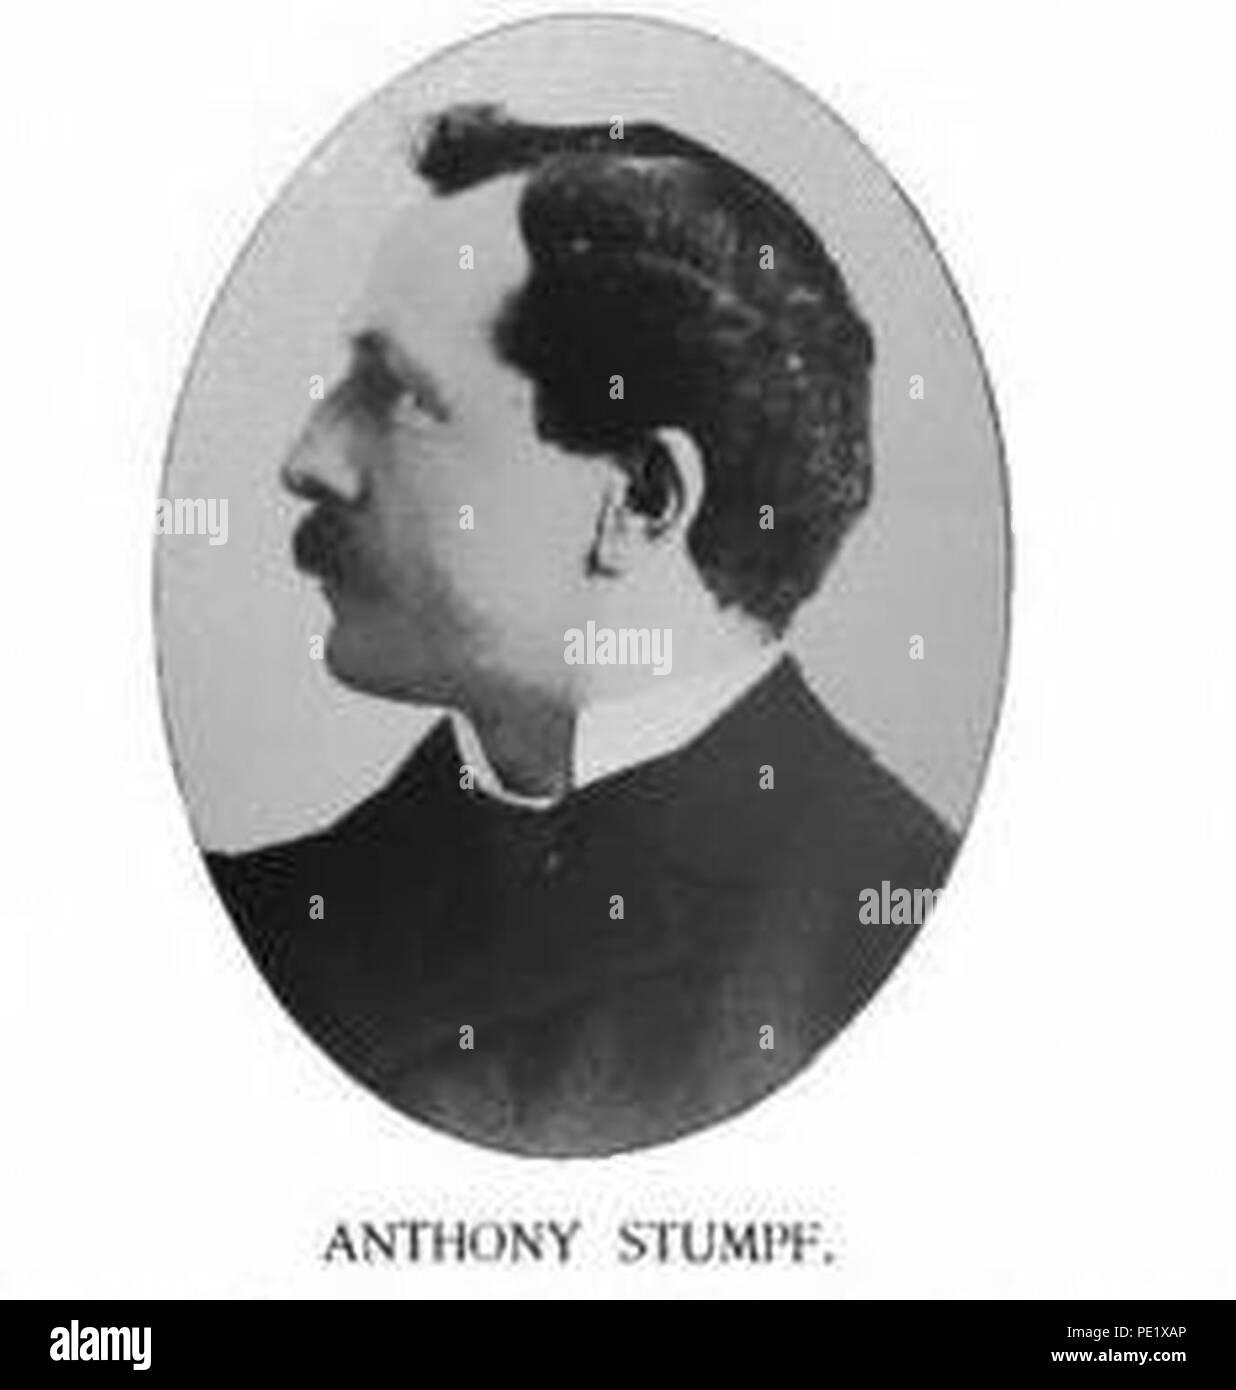 Anthony Stumpf. Stock Photo